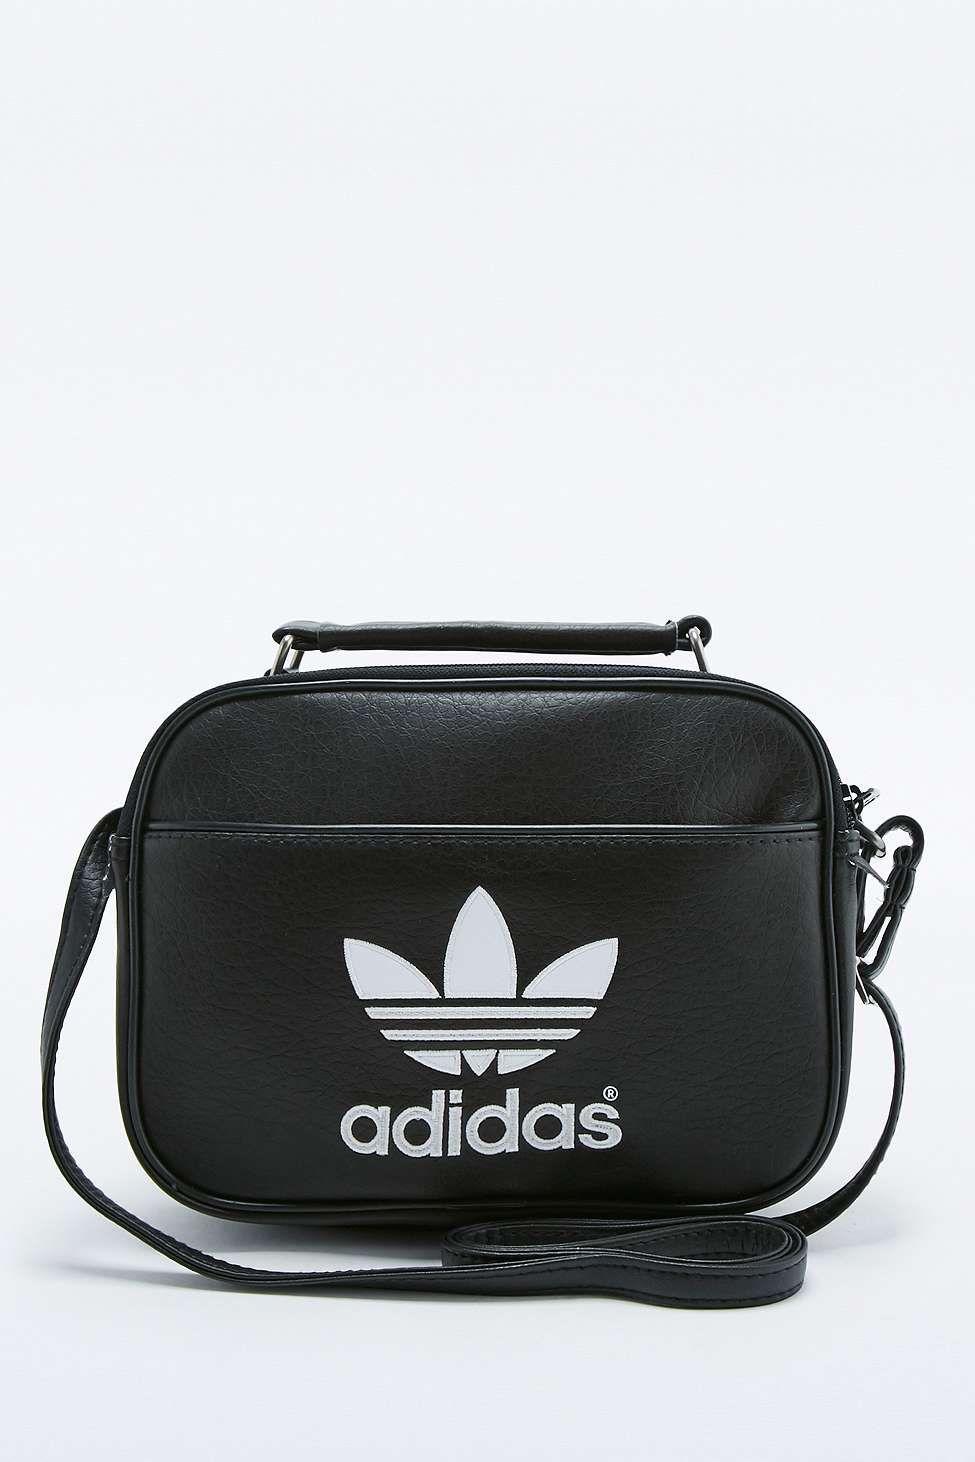 Adidas Pinterest Mini Bag Black Wish List Originals Airliner r0g14wprxq